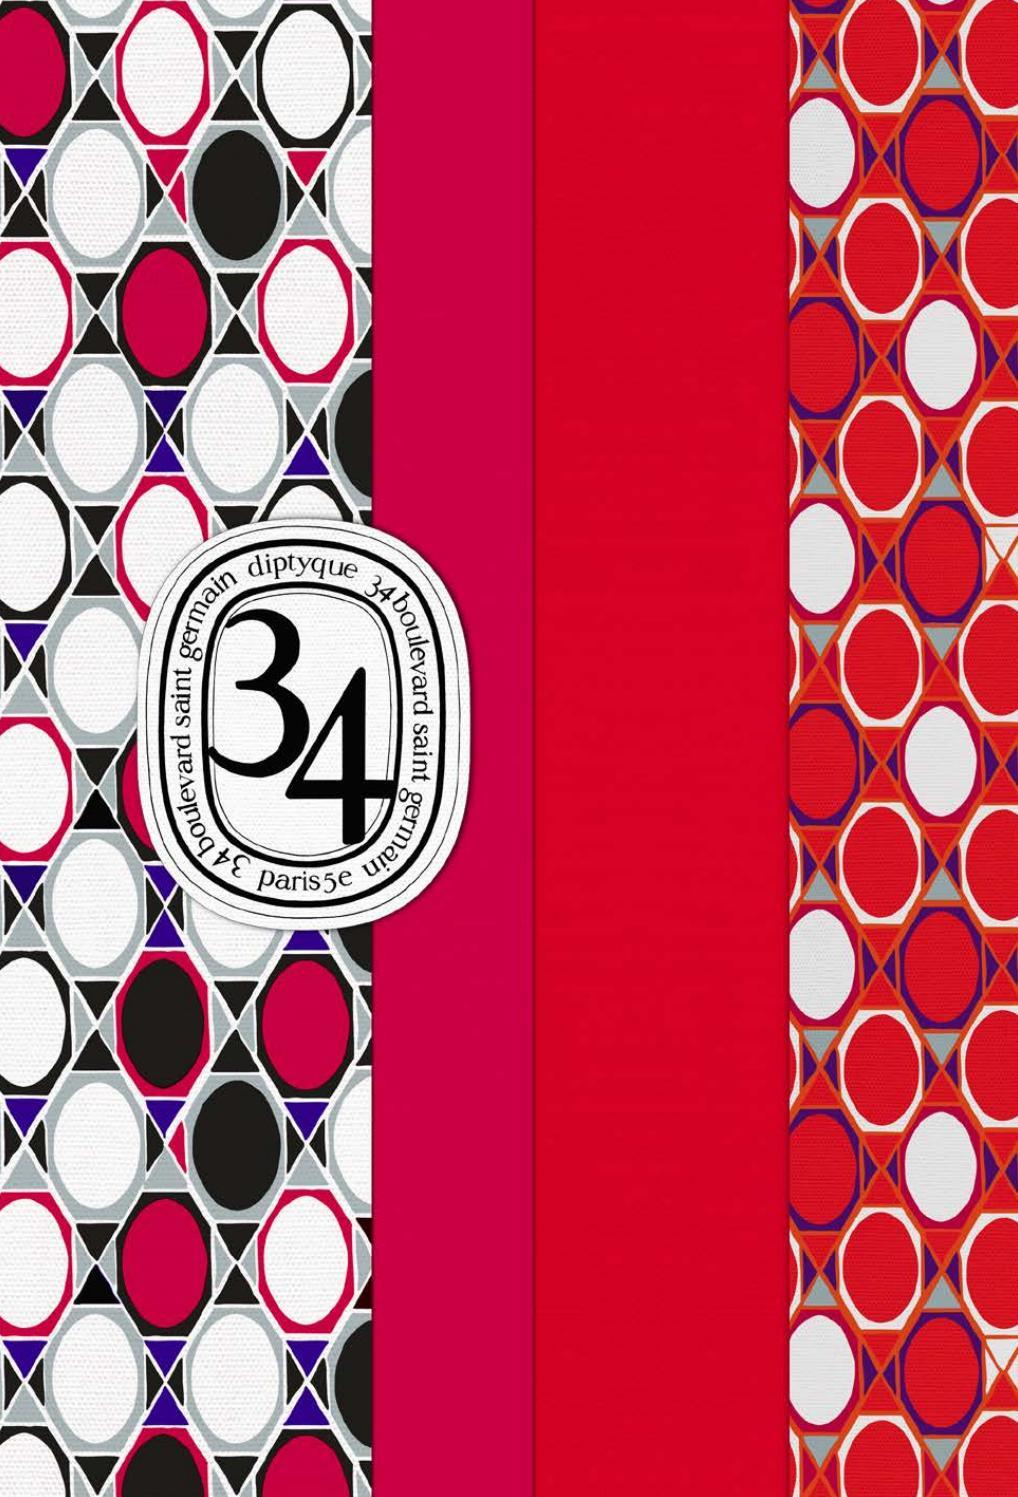 Studio Jean Marc Gady la collection 34 - diptyquemass confusion - issuu